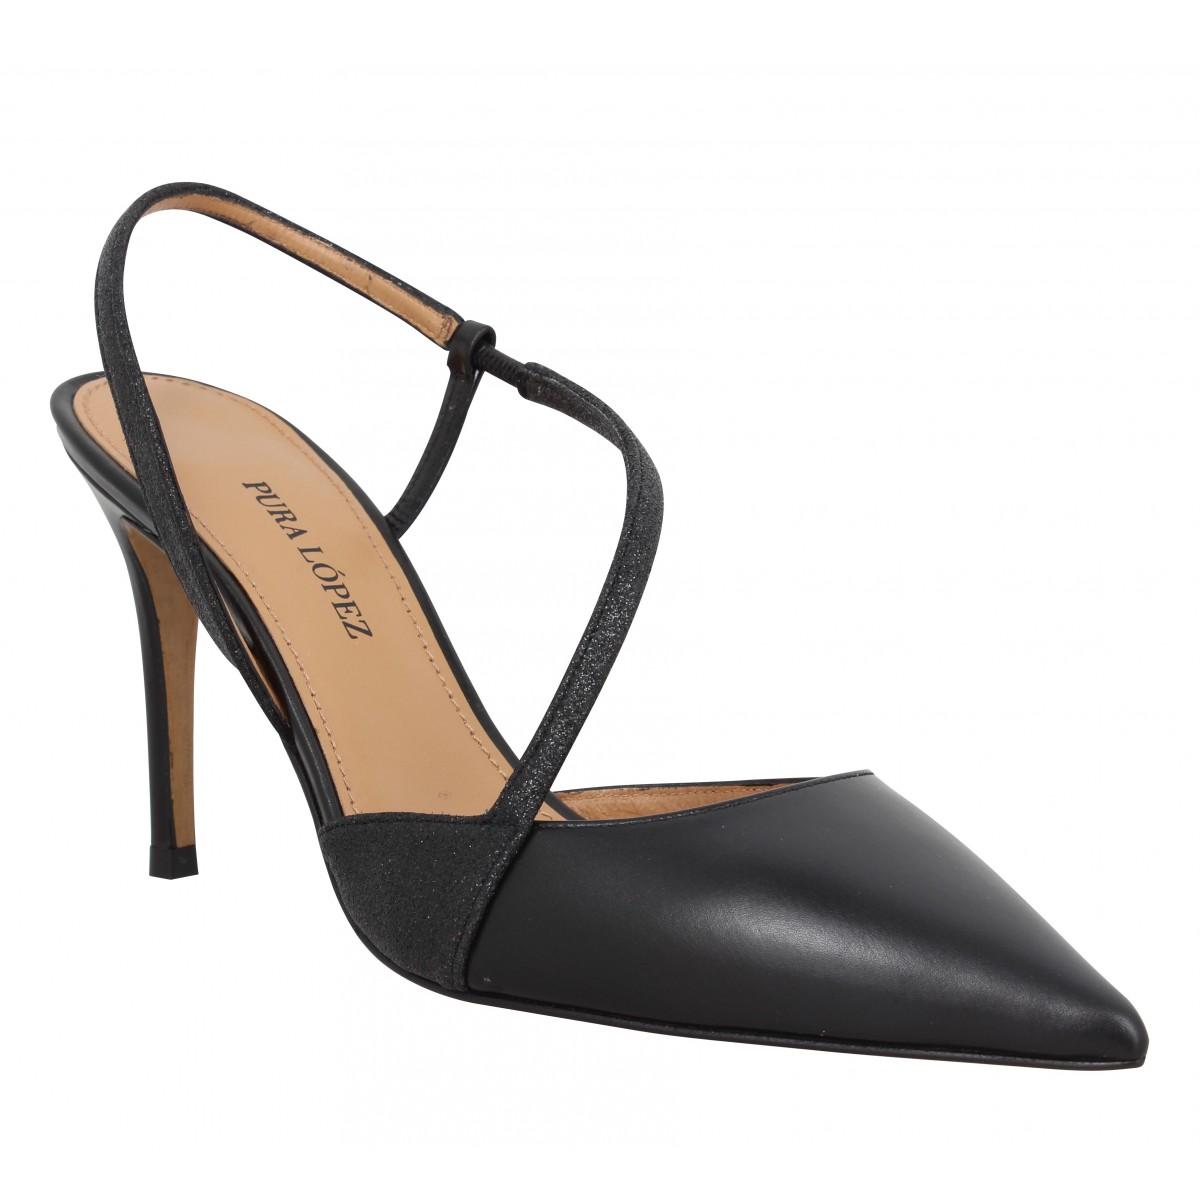 Escarpins PURA LOPEZ AQ115 cuir glitter Femme Noir